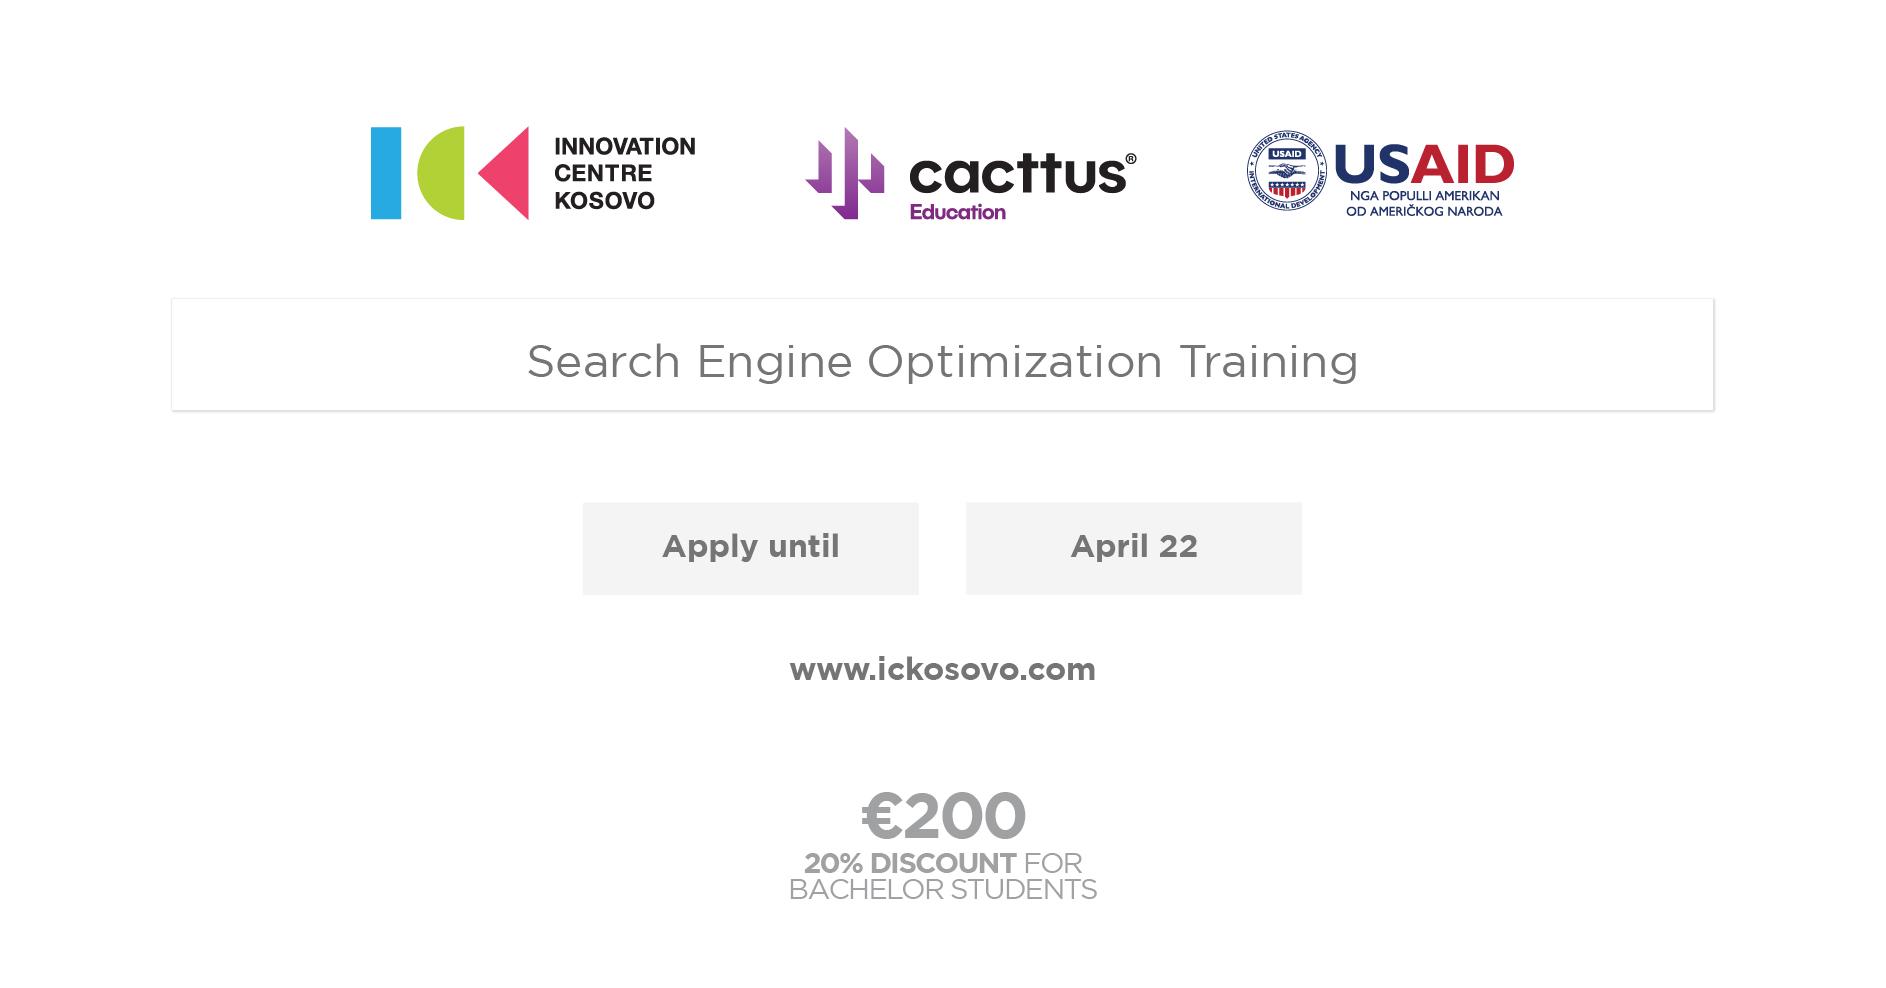 ickosovo.com - Search Engine Optimization